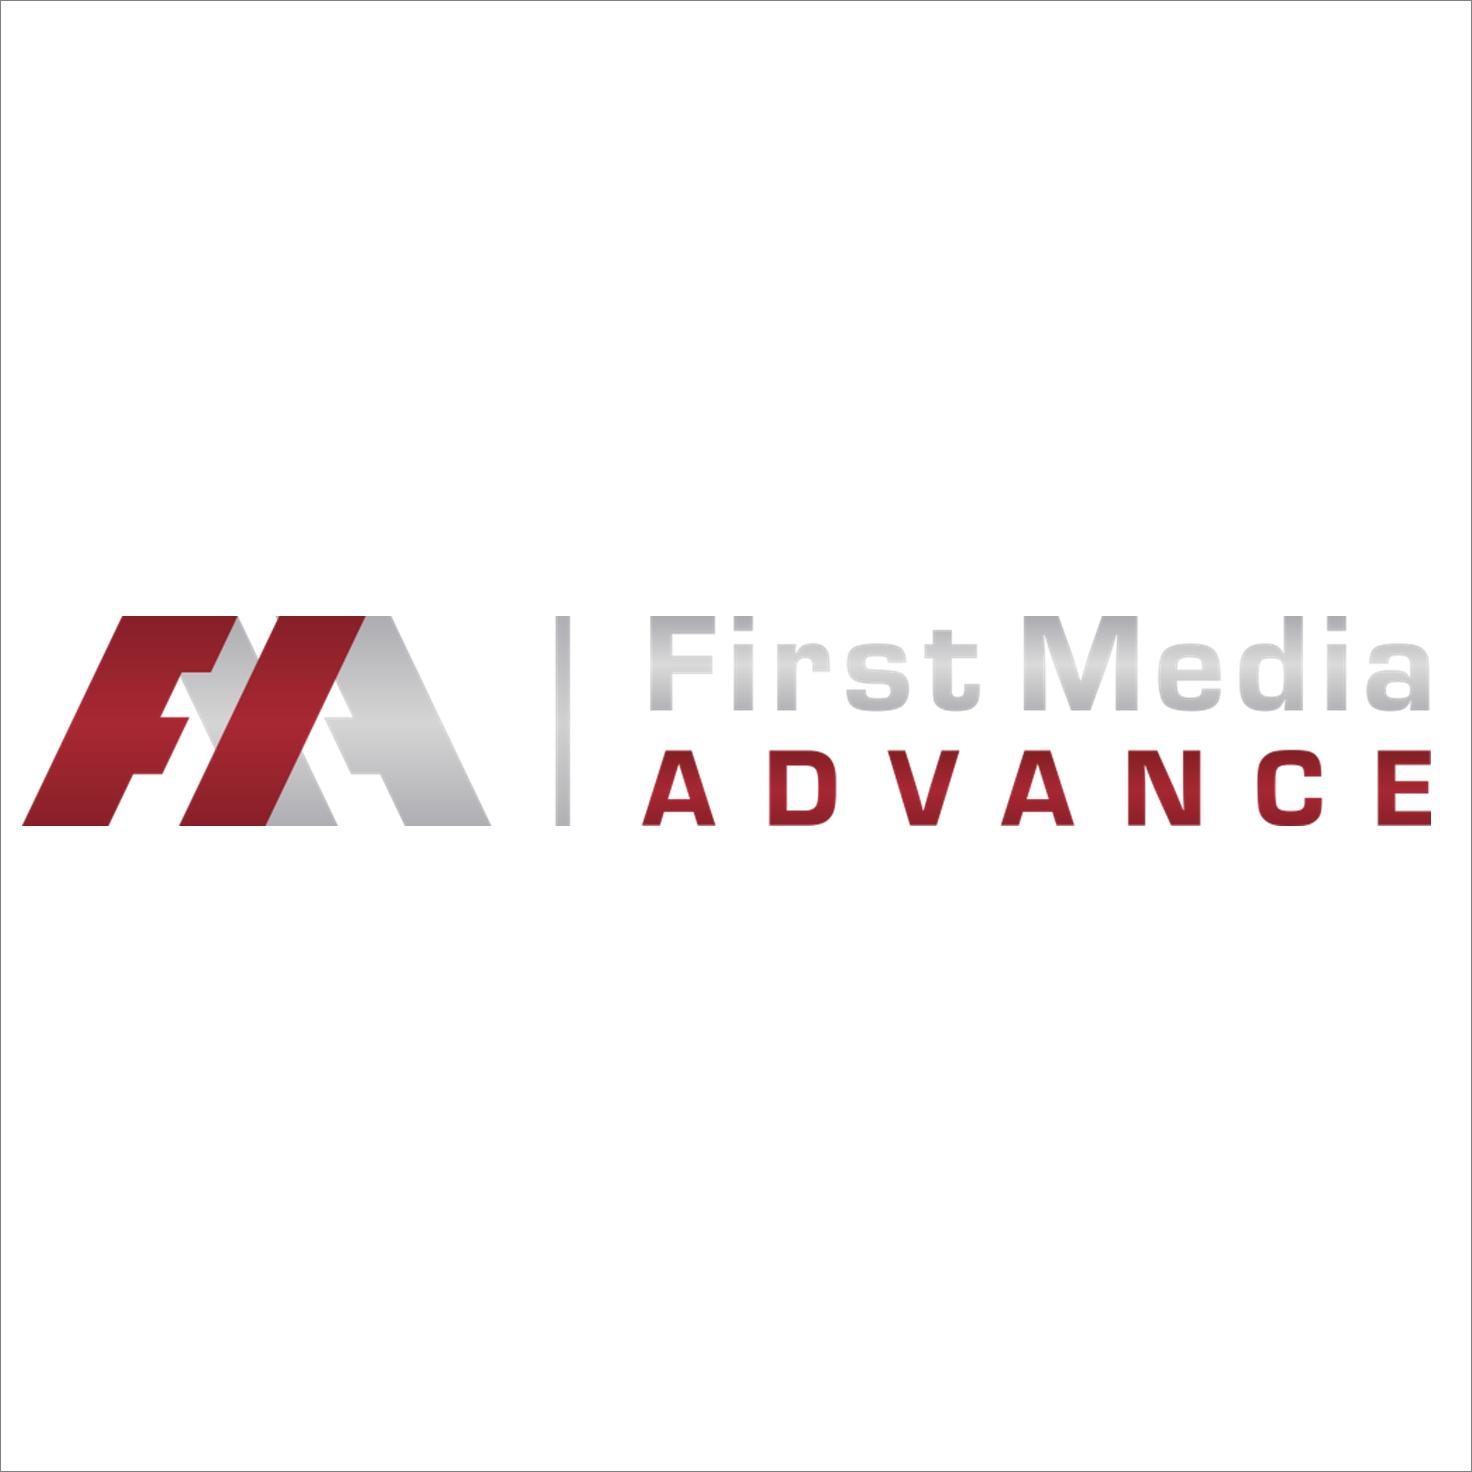 First Media Advance